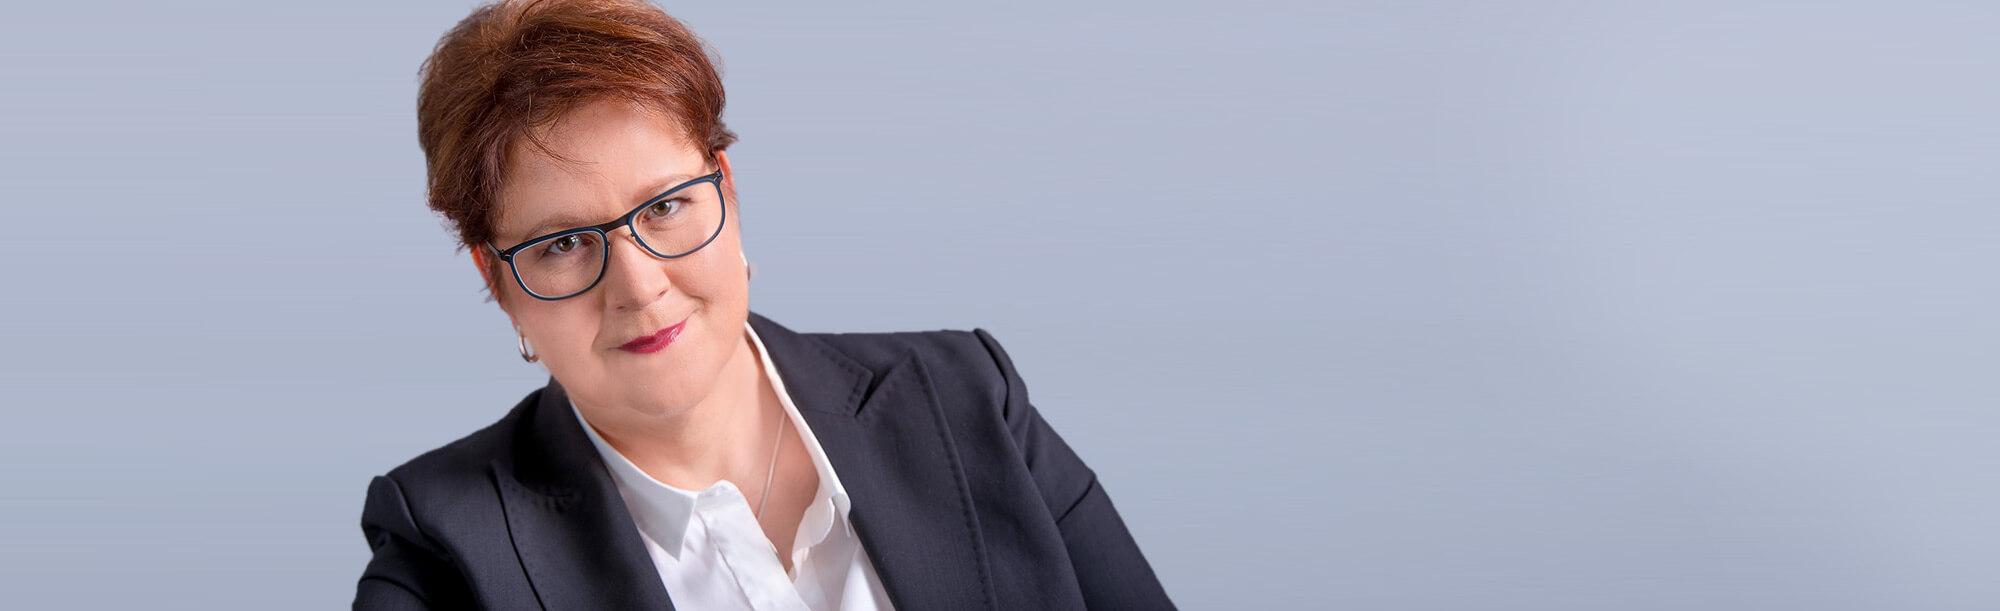 DR. DANIELA SCHAPER